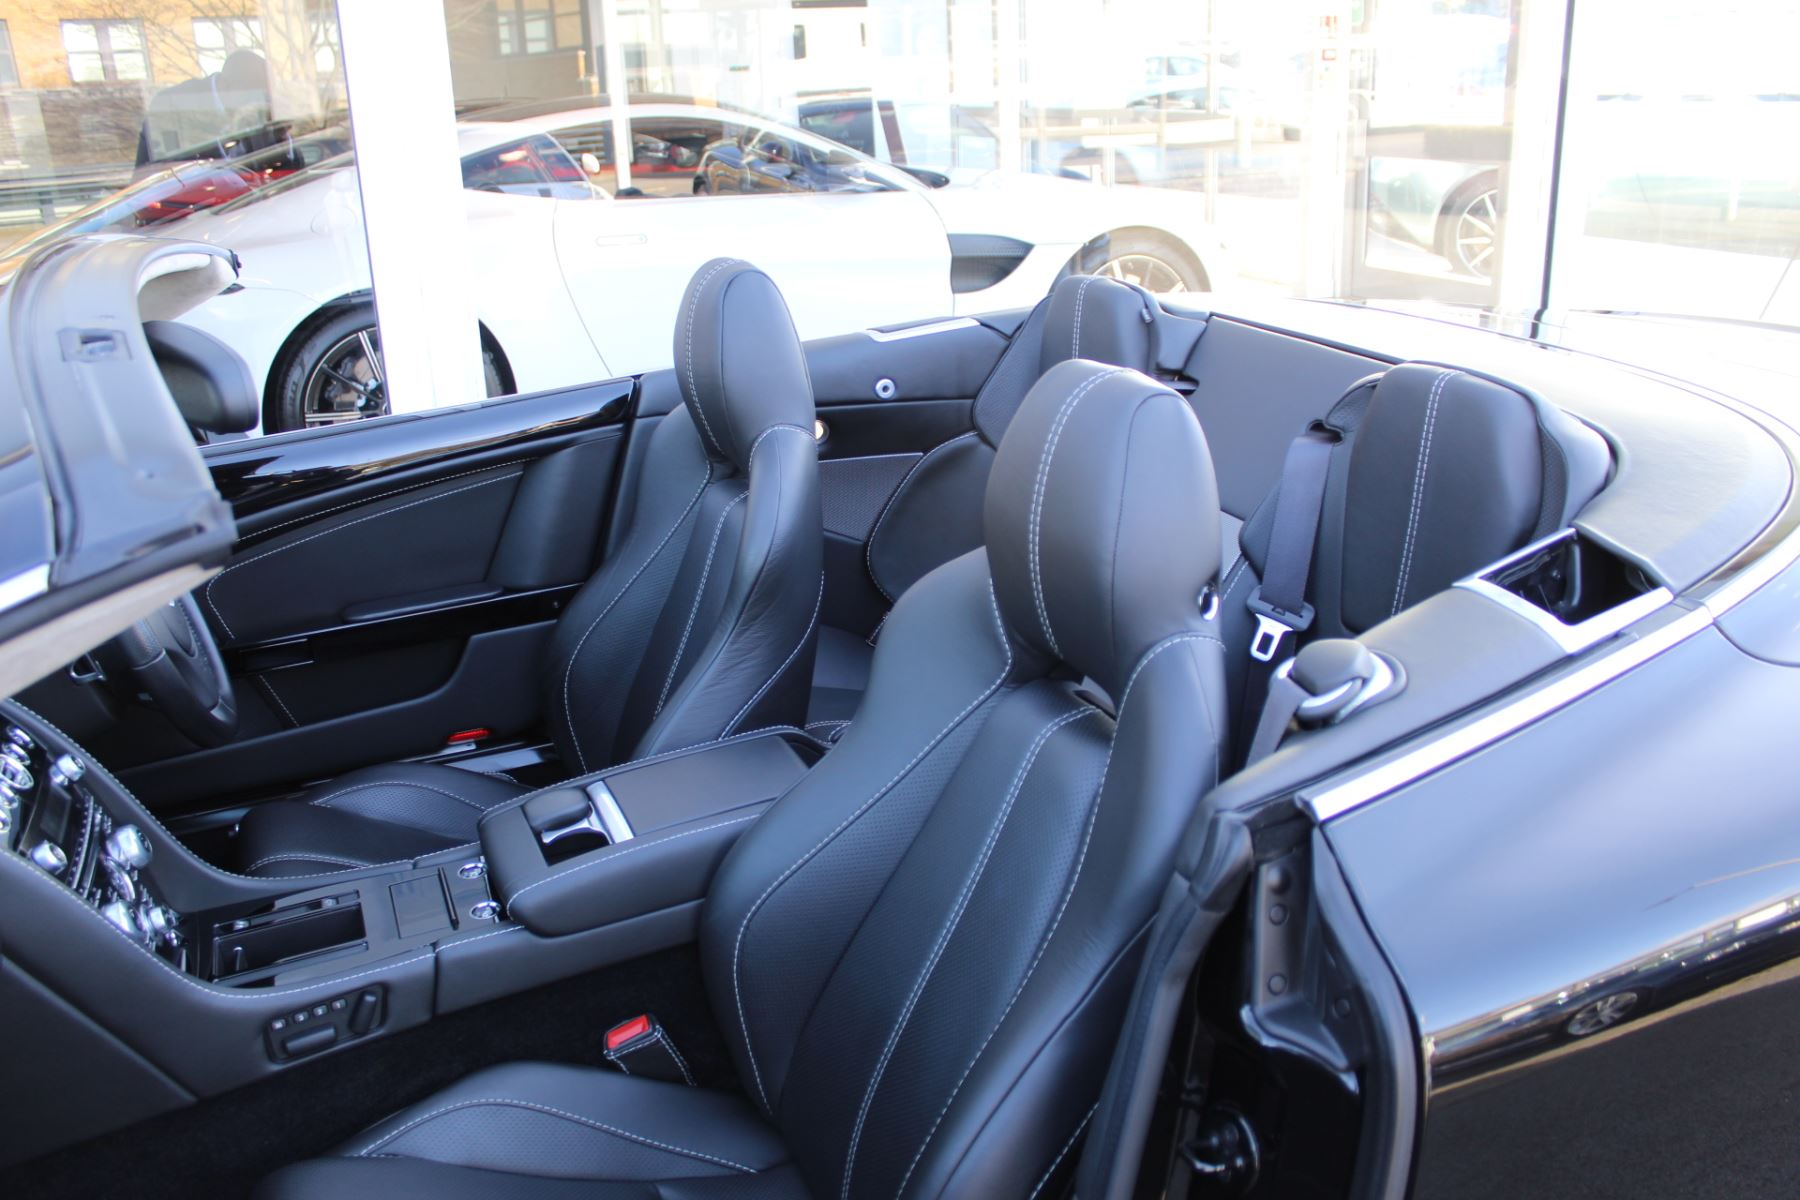 Aston Martin DB9 V12 2dr Volante Touchtronic [470] image 11